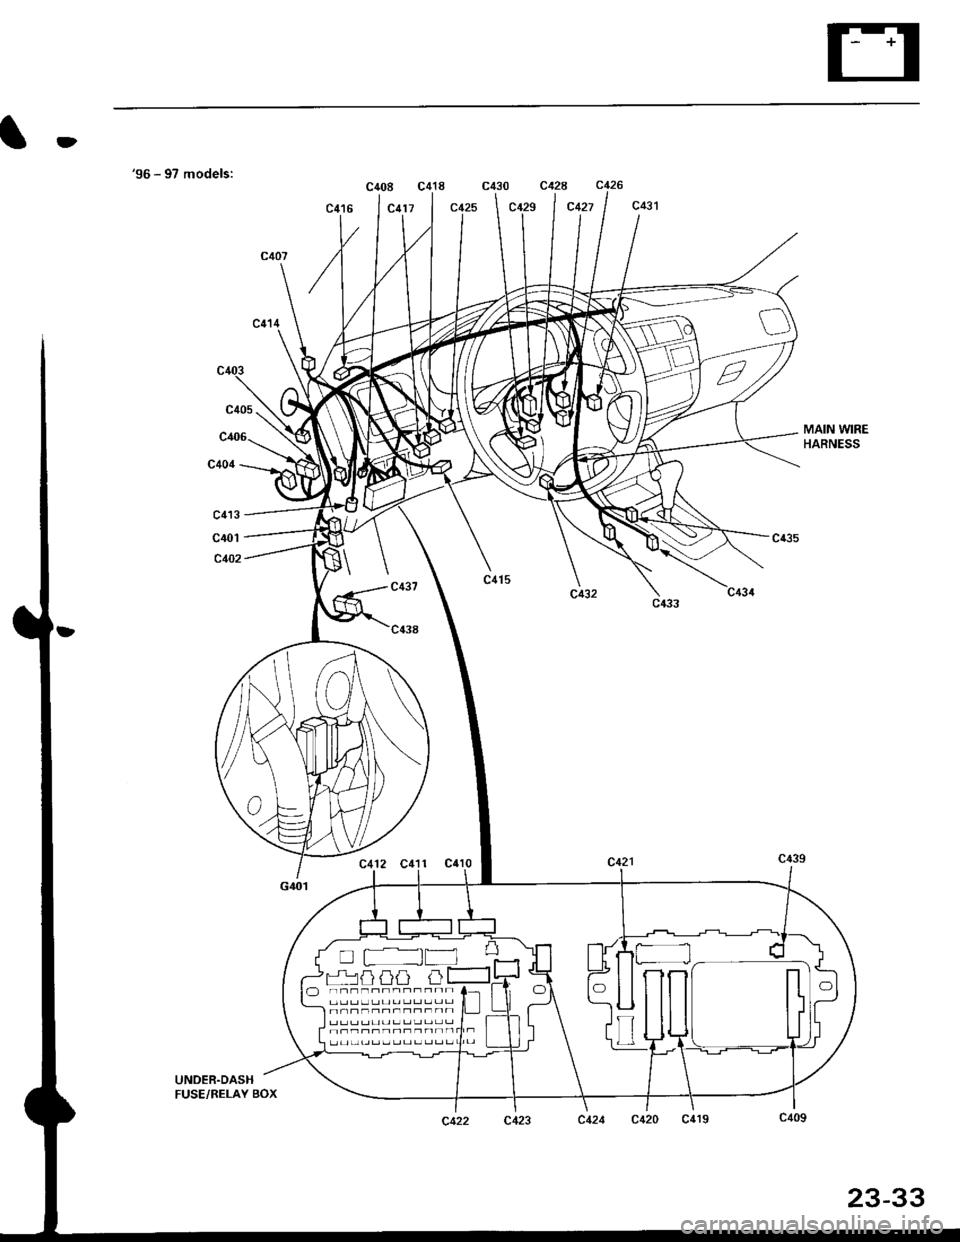 Honda Civic 1999 6 G Workshop Manual  2189 Pages   Page 1510  D Under Relay Box Main